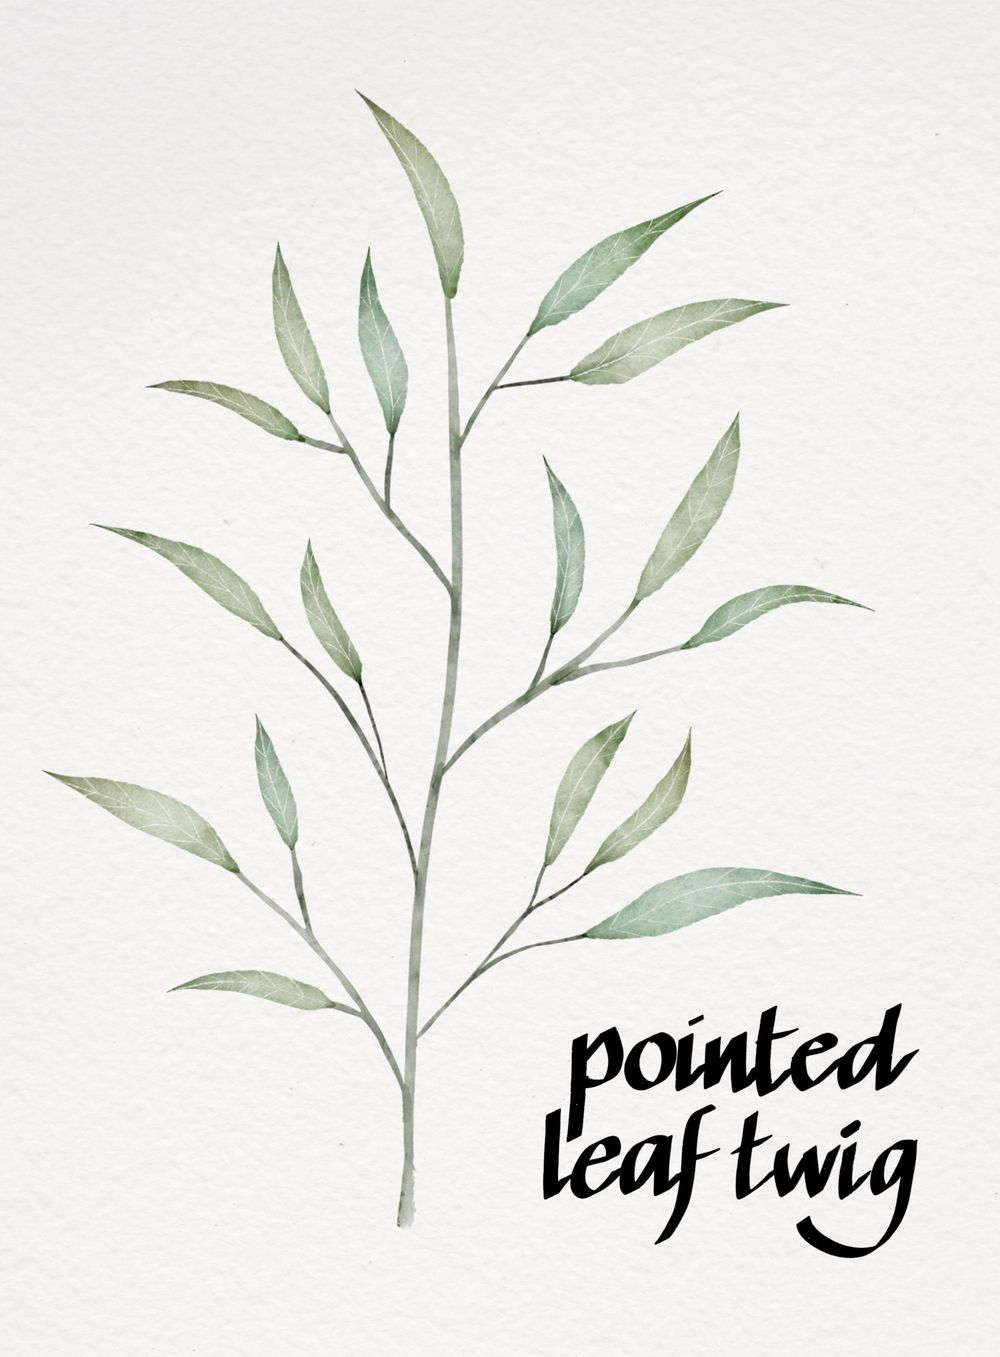 My Botanicals - image 5 - student project